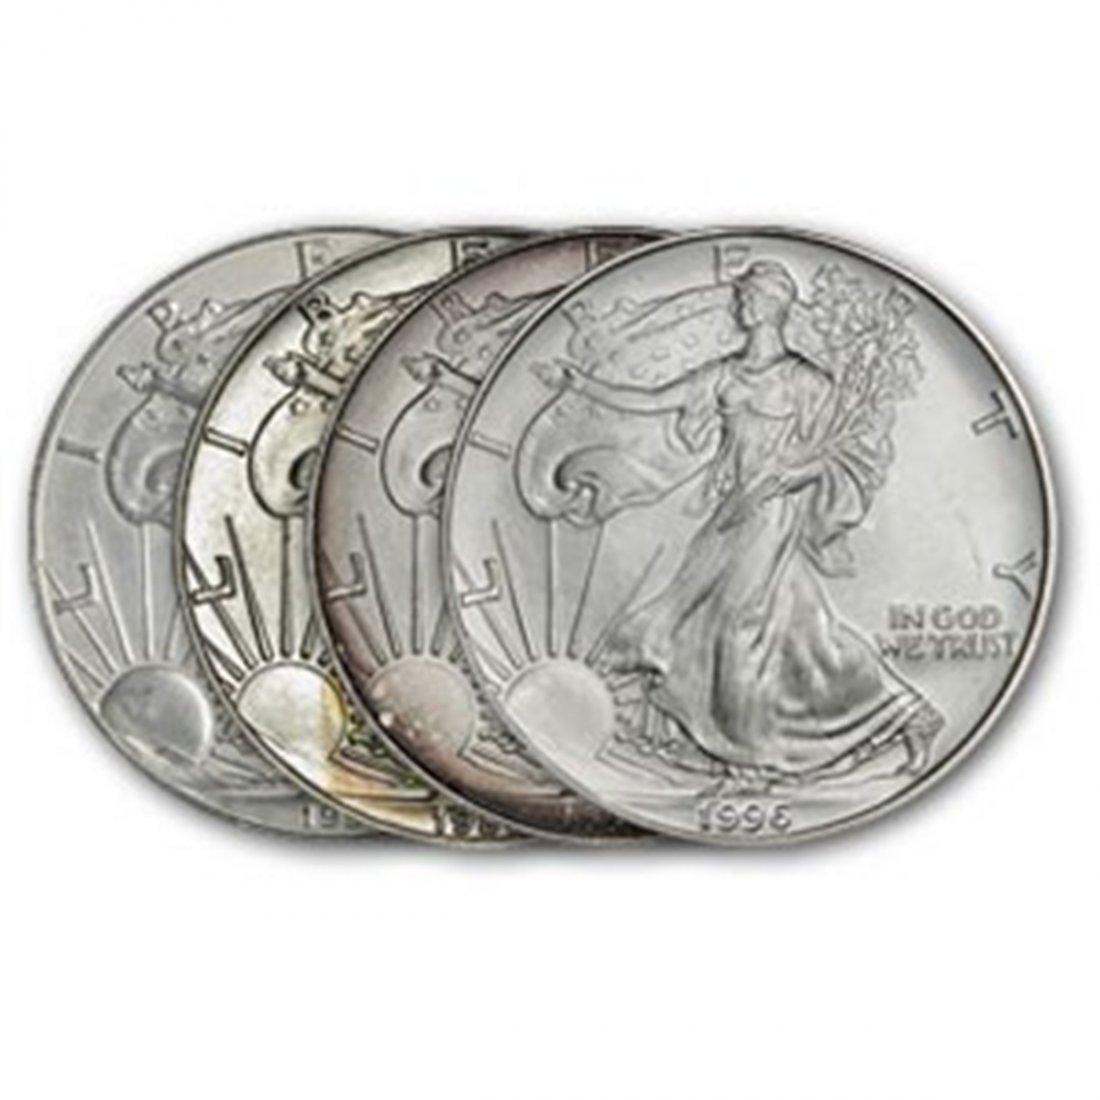 Lot of 4 Random Date US Silver Eagles